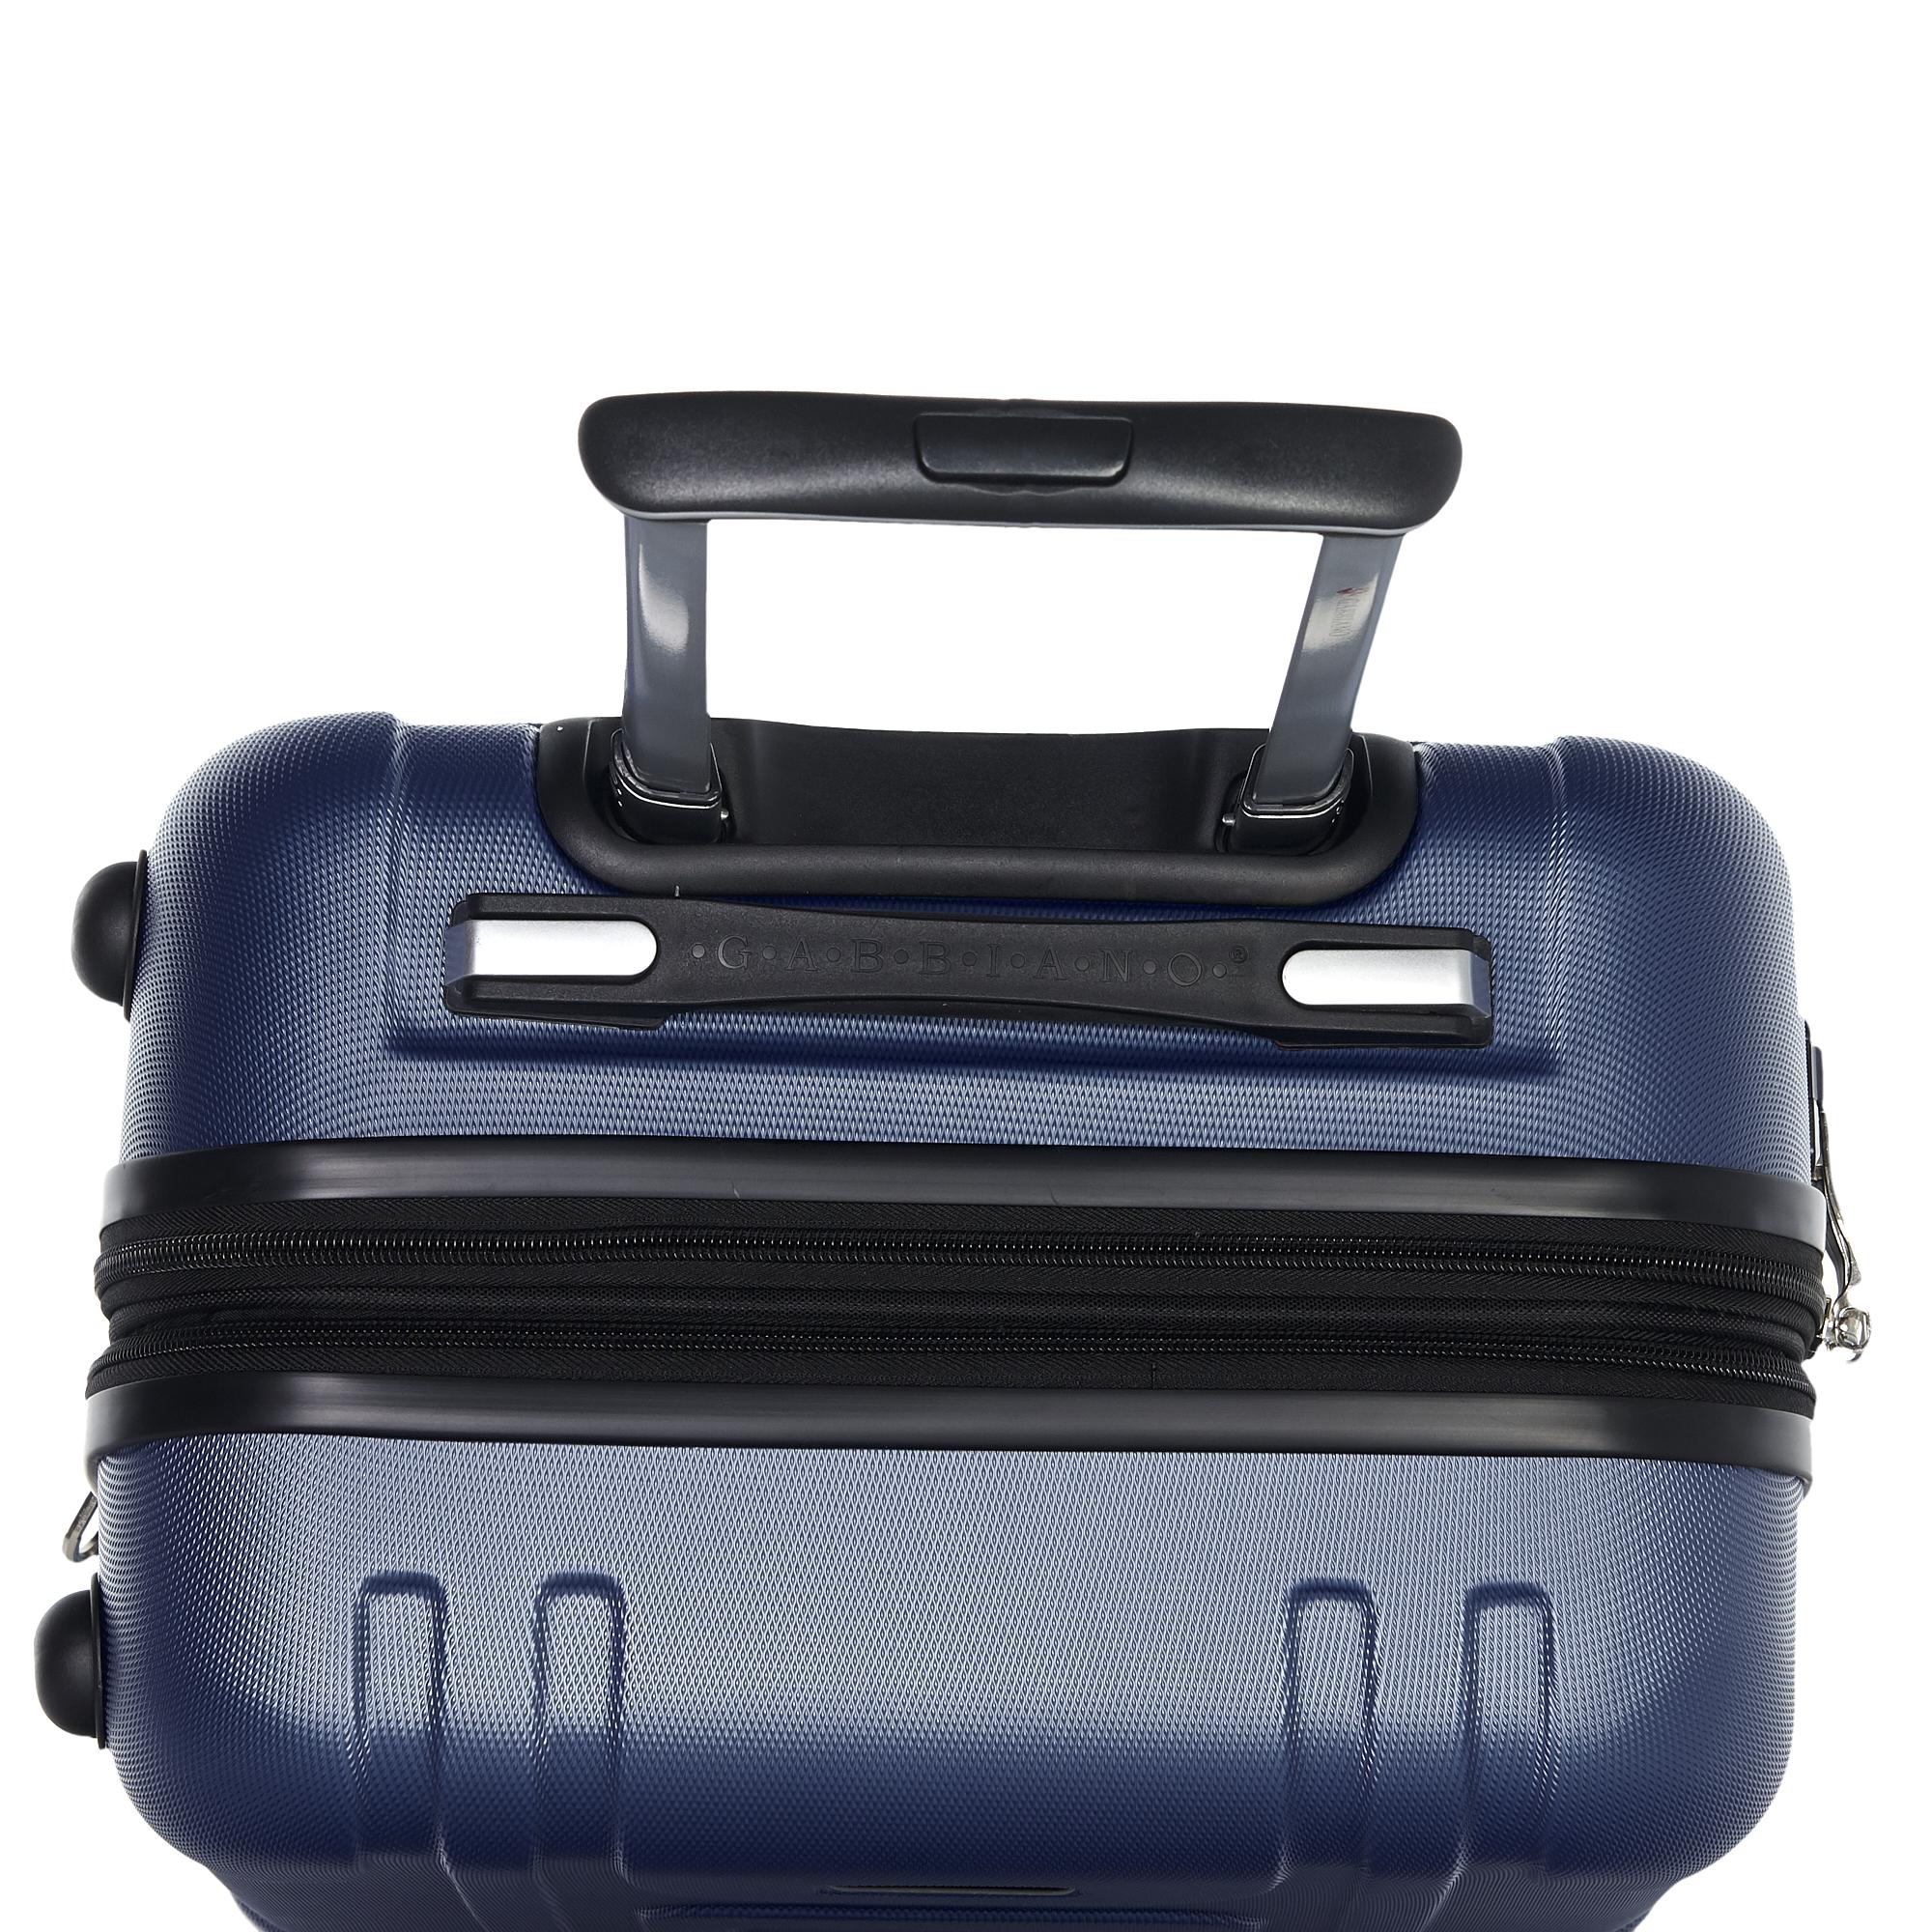 LG_GA2150_BLUE_TOP